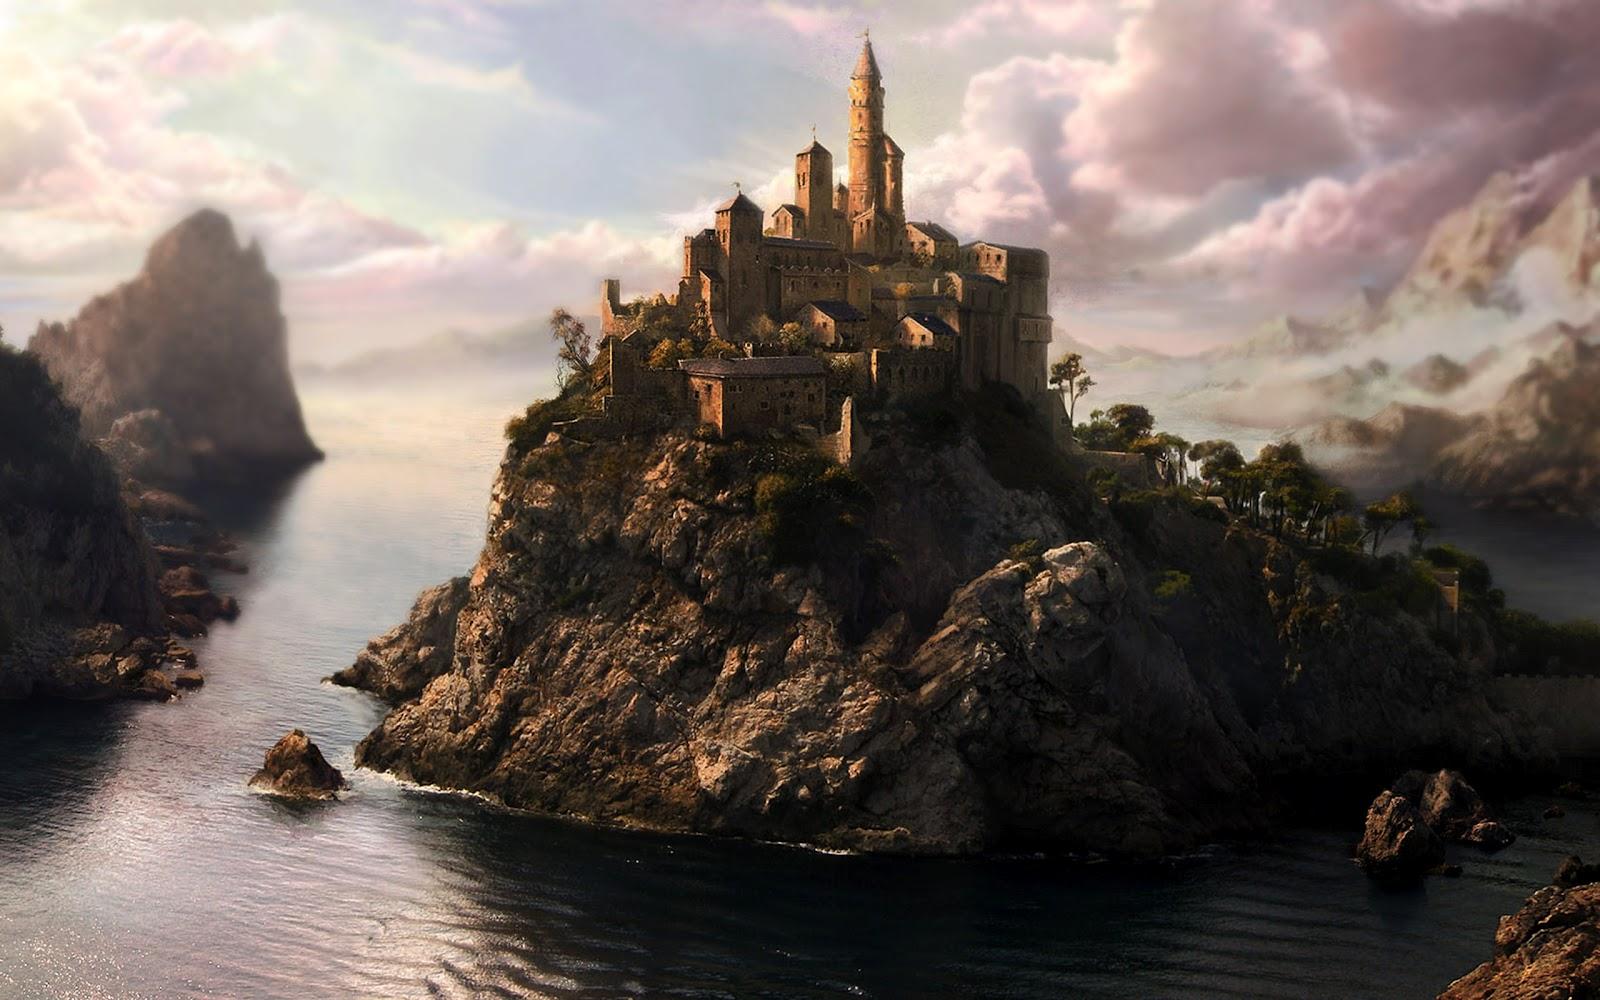 island 3d picture wallpaper - photo #13